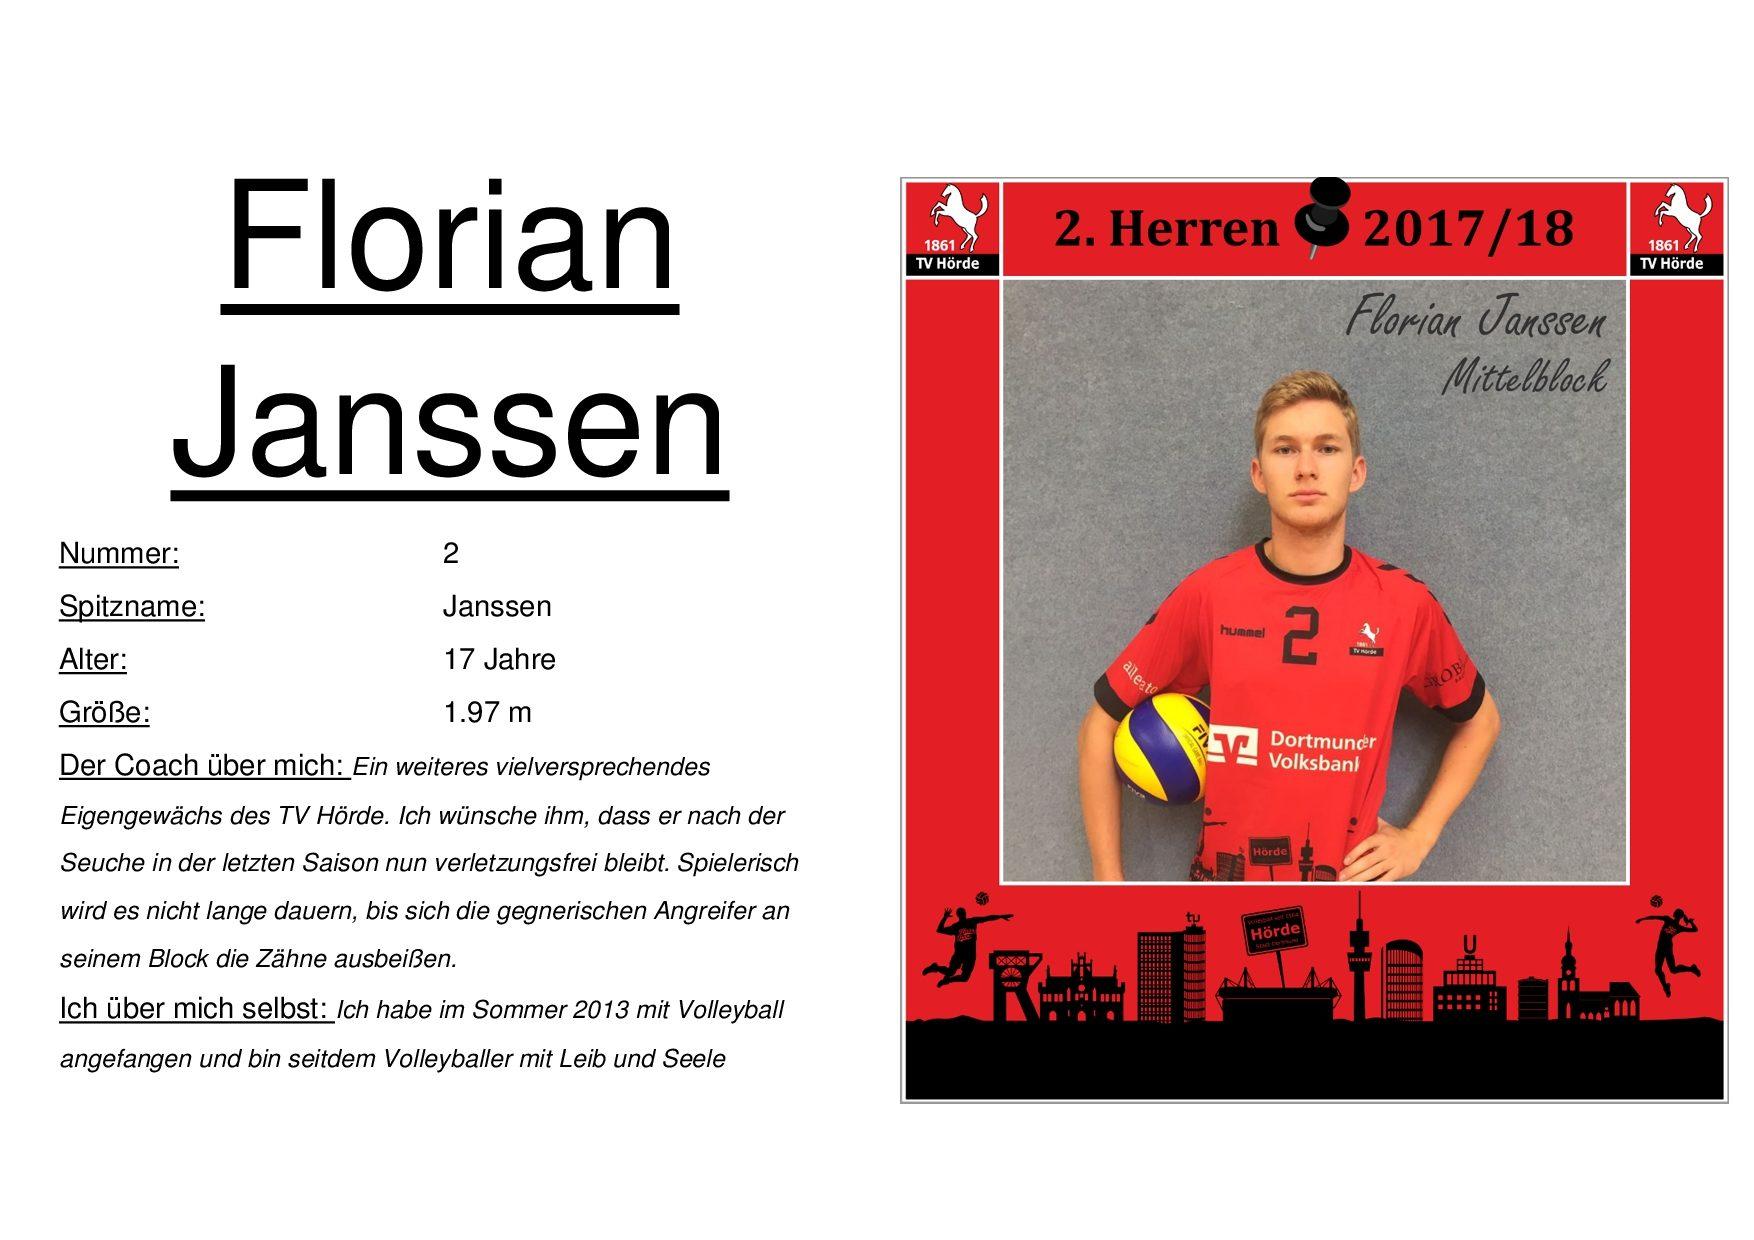 Florian Janssen